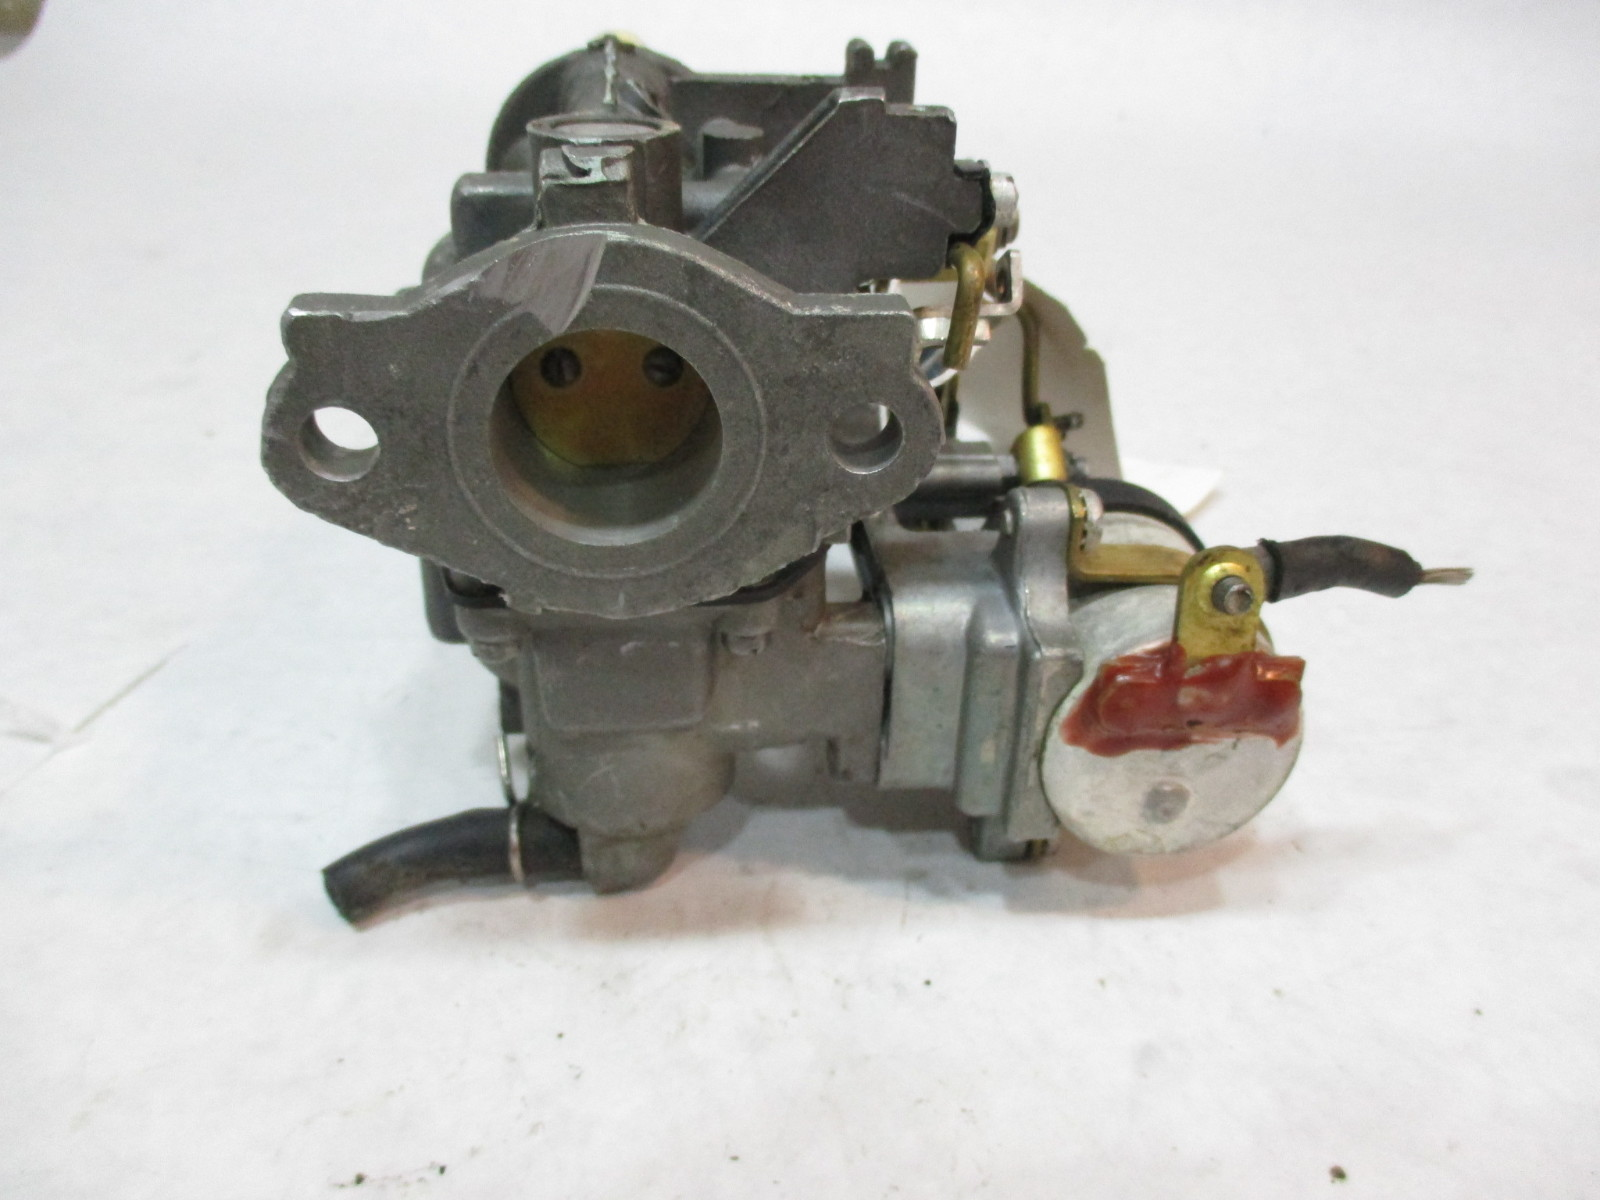 0381718 Johnson Outboard Fd 22a Carb Carburetor Electric Choke